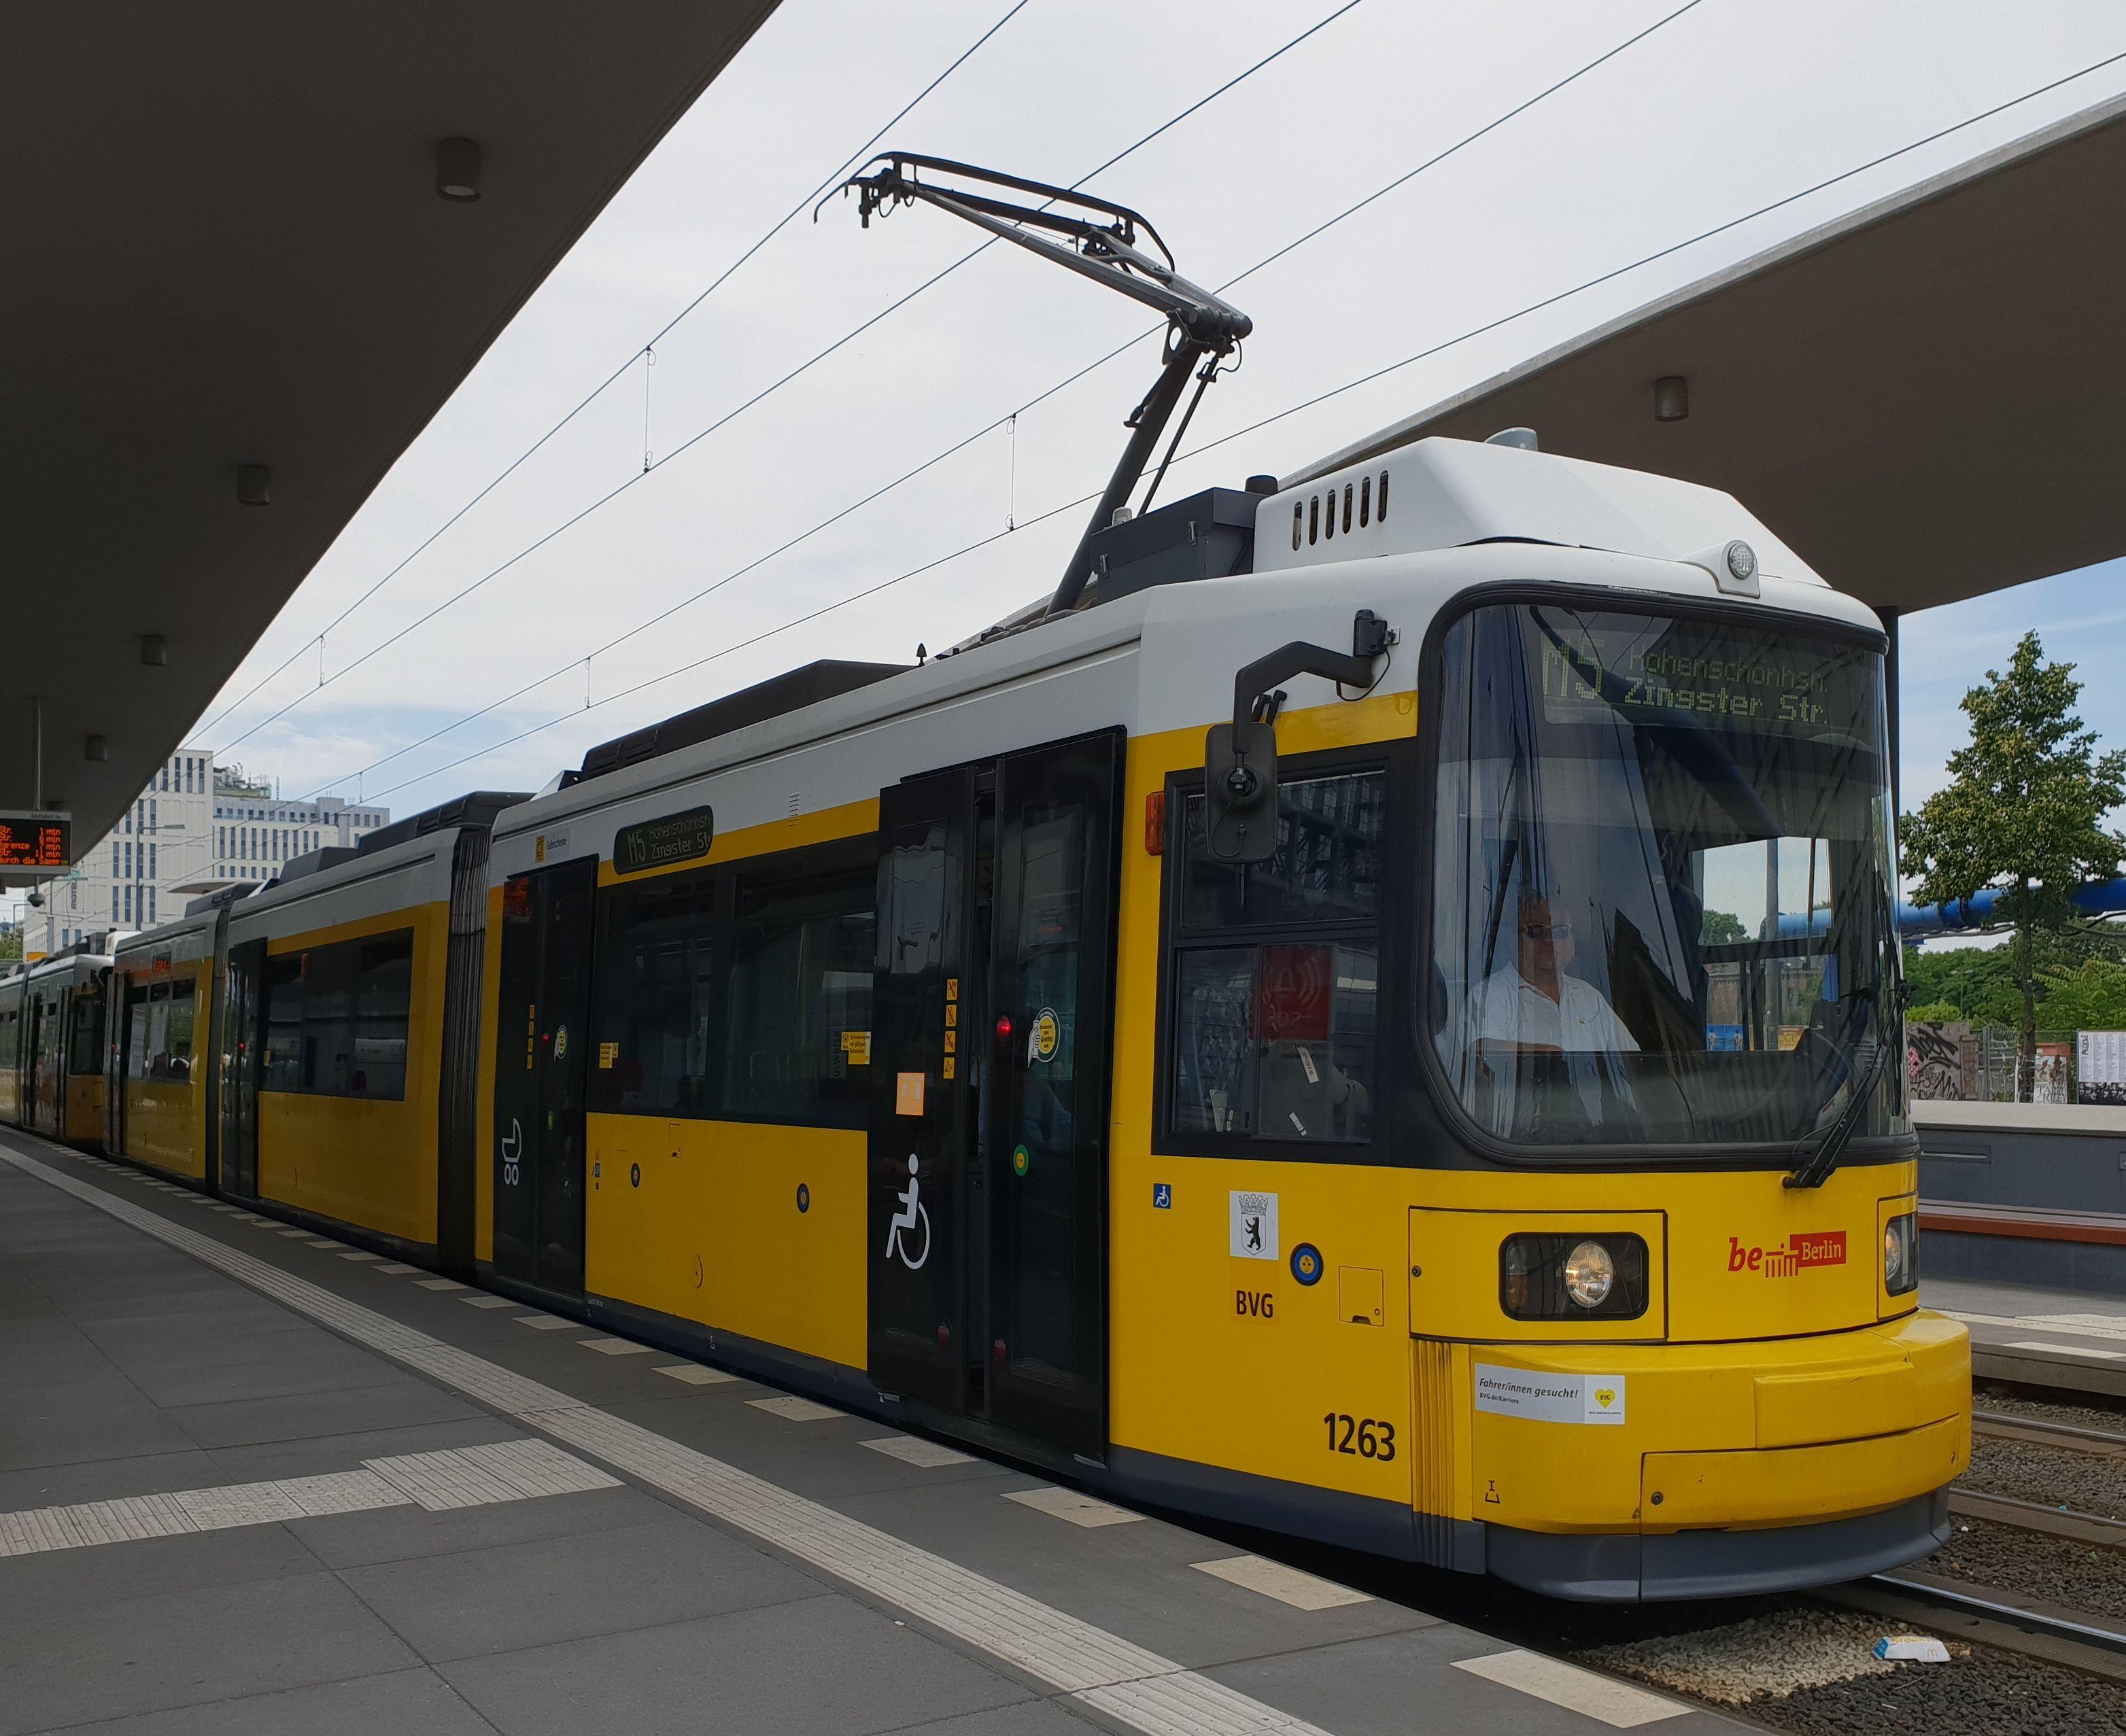 Foto: Straßenbahn 1263, Typ GT6U, Berlin Hbf, 2018